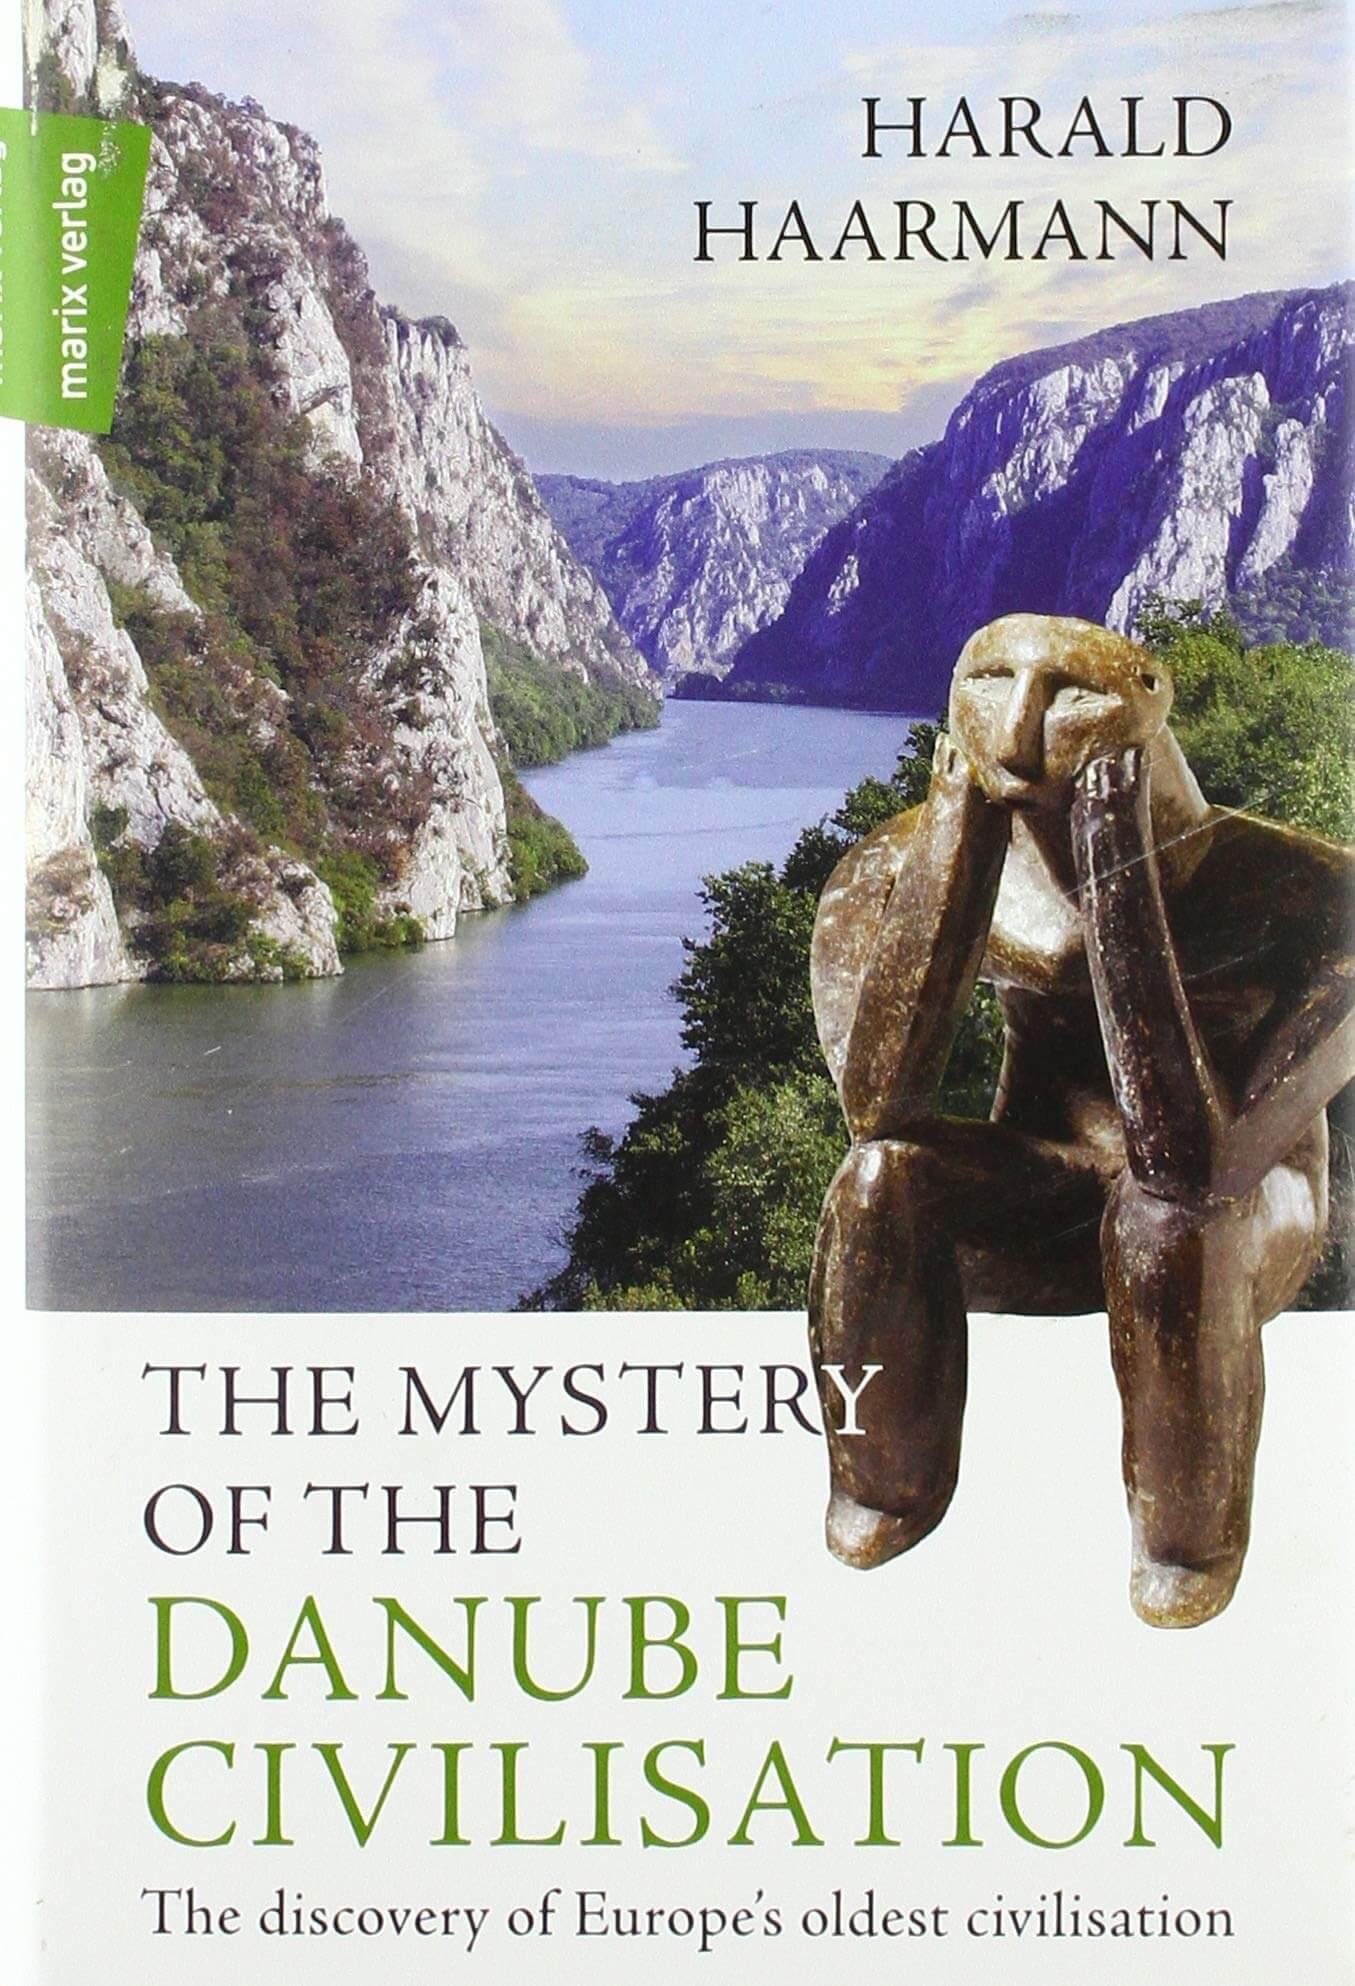 the Danube SCRIPT @ Harald Haarmann